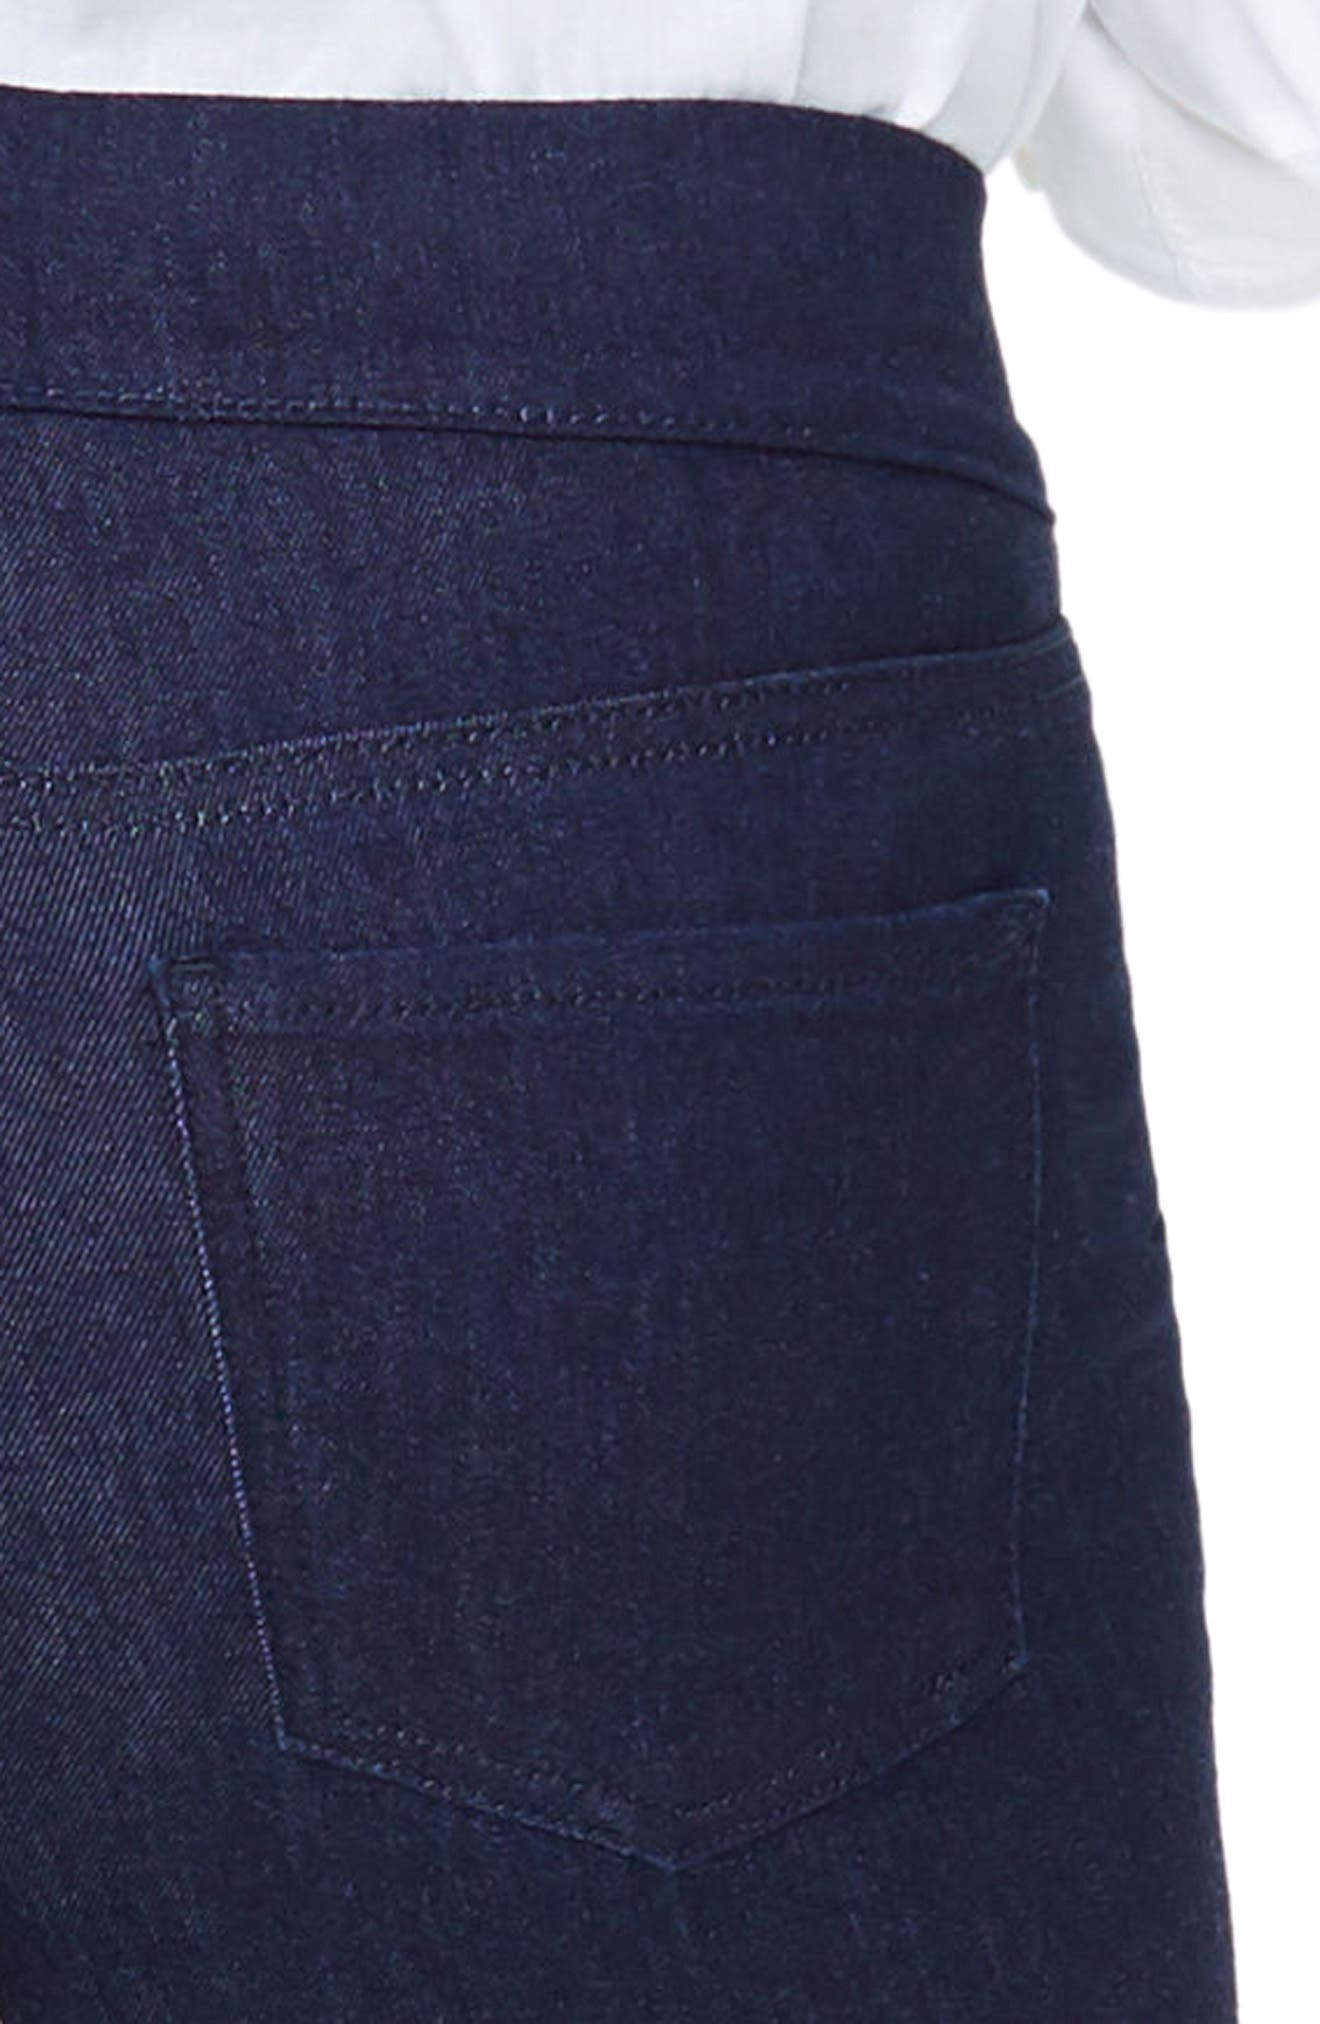 Pull-On Stretch Skinny Capri Jeans,                             Alternate thumbnail 5, color,                             Rinse